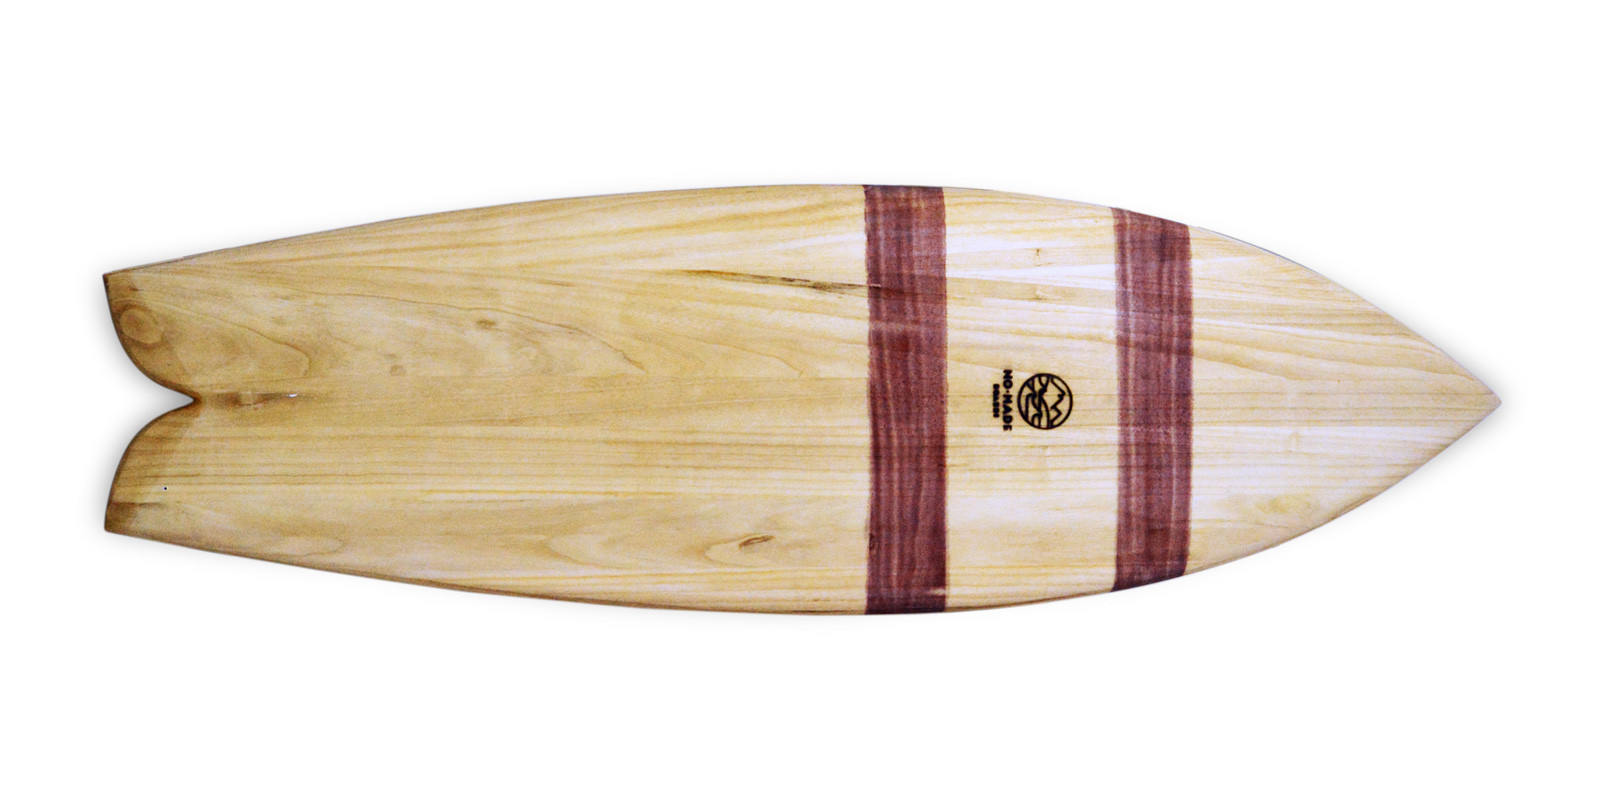 DIY Wood Surfboard  Wooden Surfboard KIT DIY Langre No Made Boards